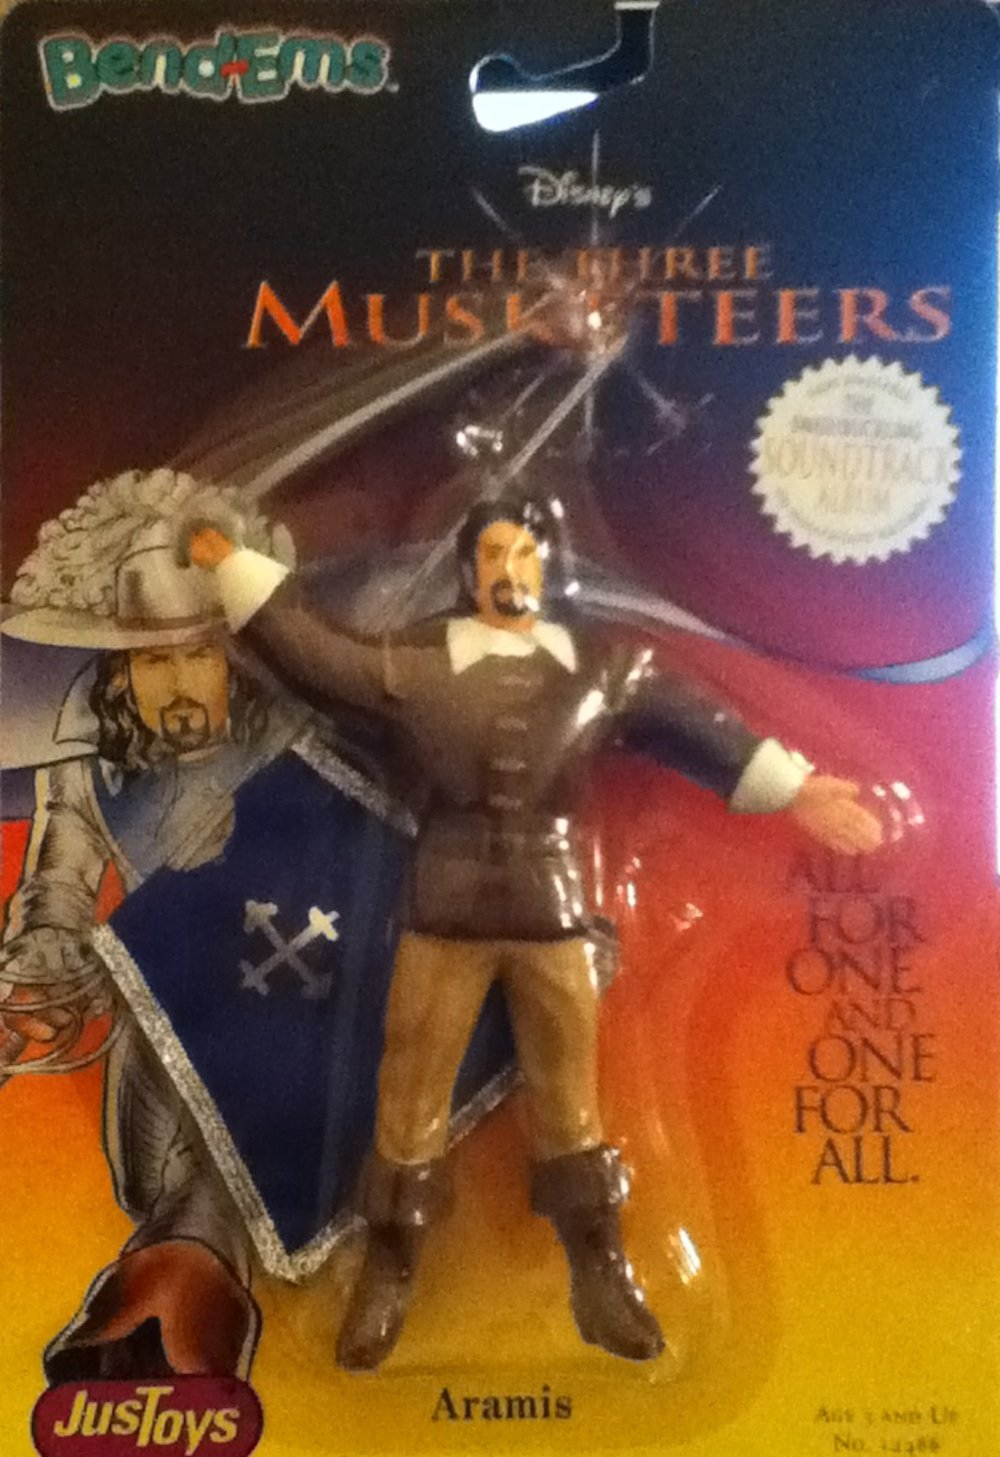 The Three Musketeers - Aramis (Charlie Sheen) - Bendable Figure - 1993